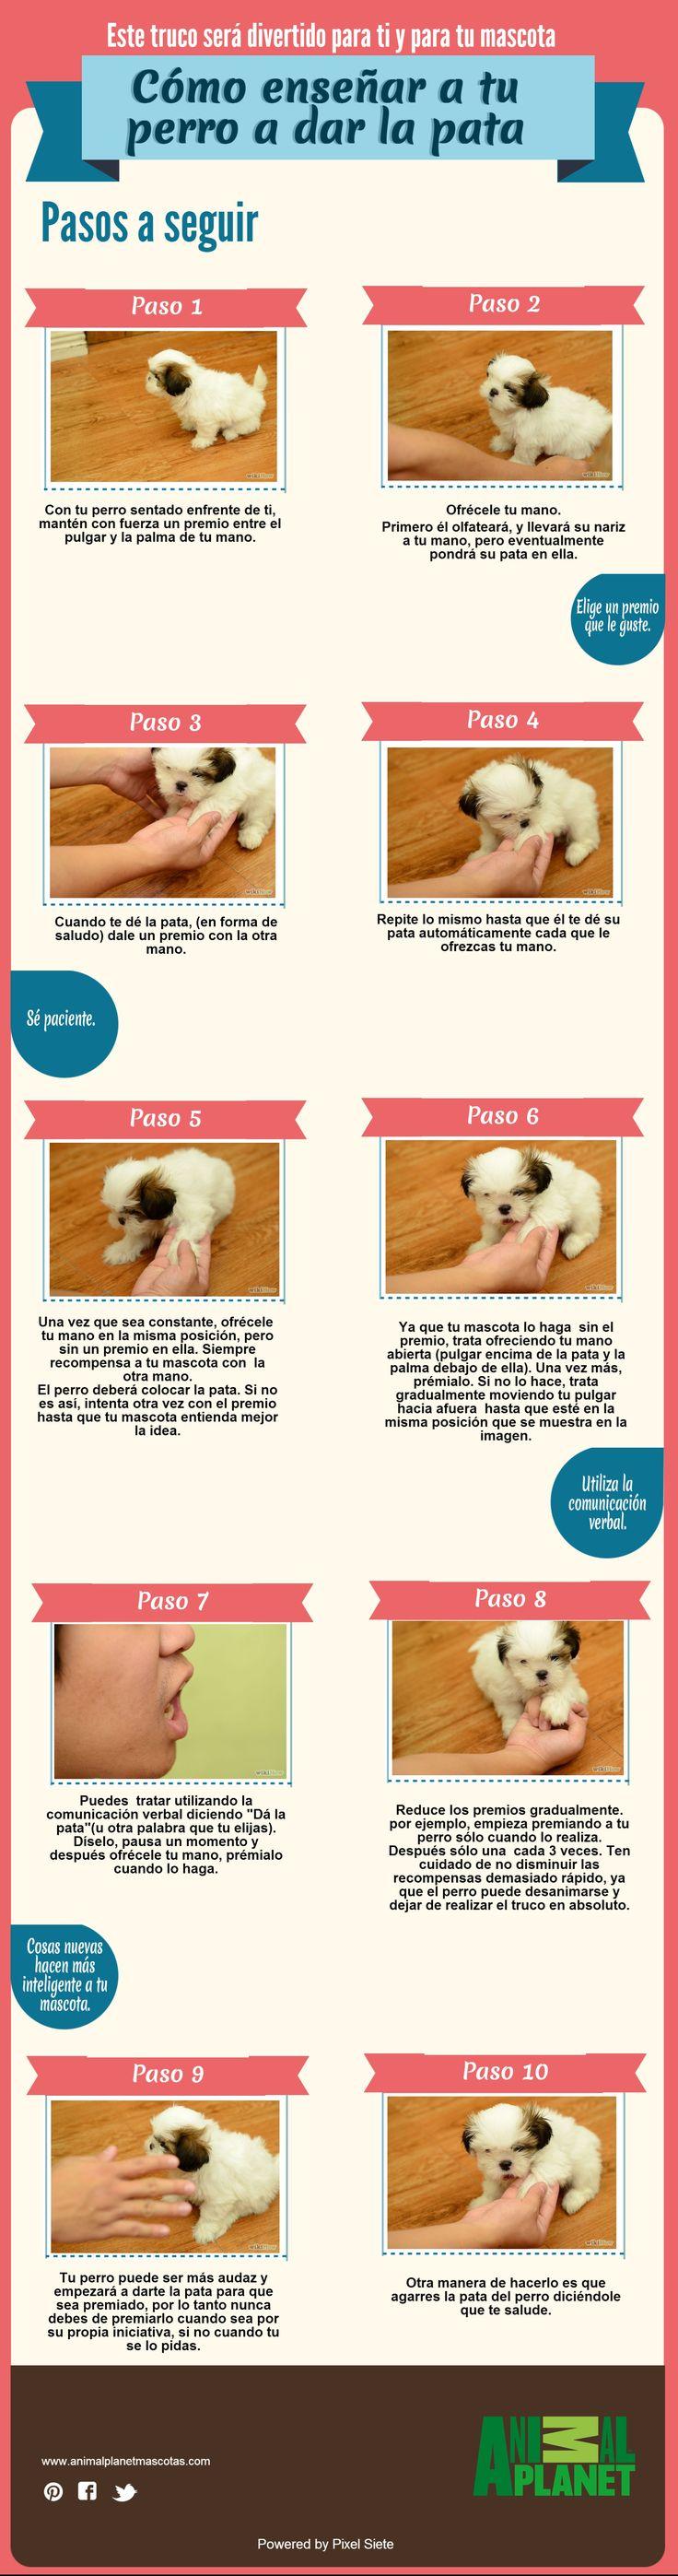 Cómo entrenar a tu mascota #Mascotas #AnimalPlanetMascotas #PixelSiete